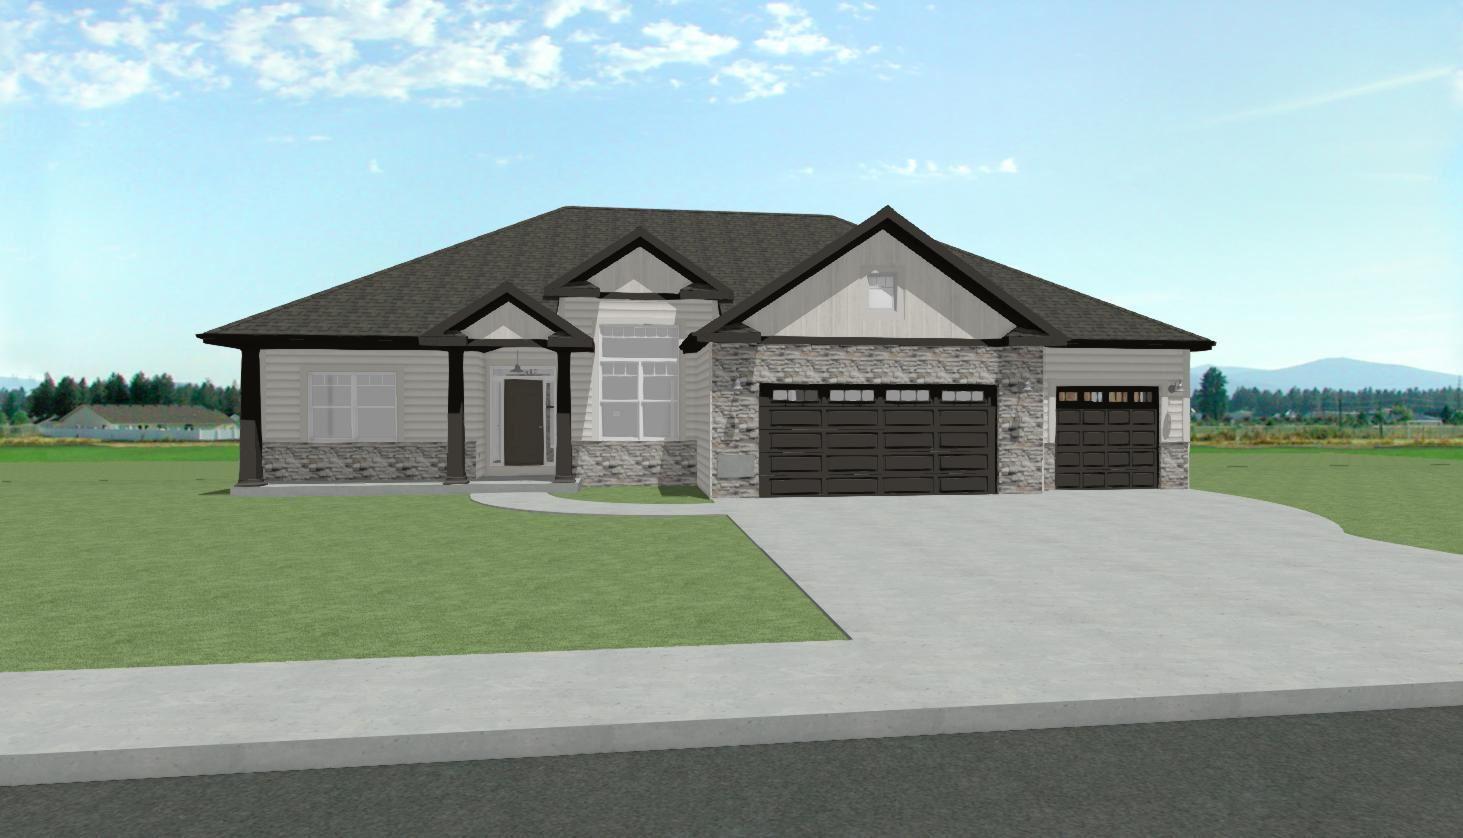 8238 Ridgeway Ct #Lt.15, Pleasant Prairie, WI 53158 - #: 1679997